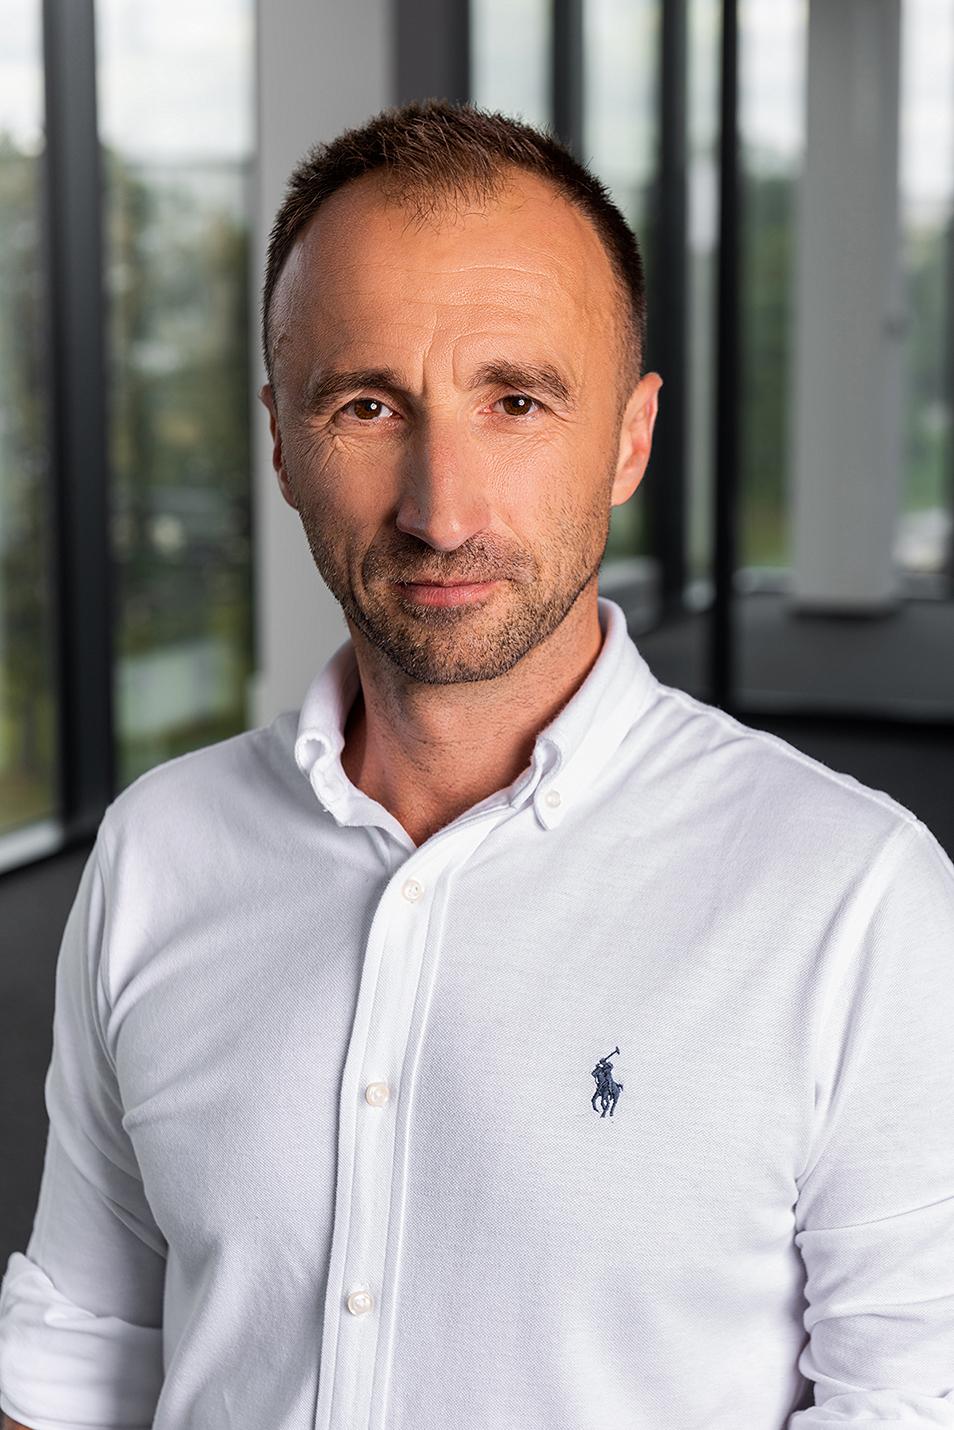 Piotr Siwiec